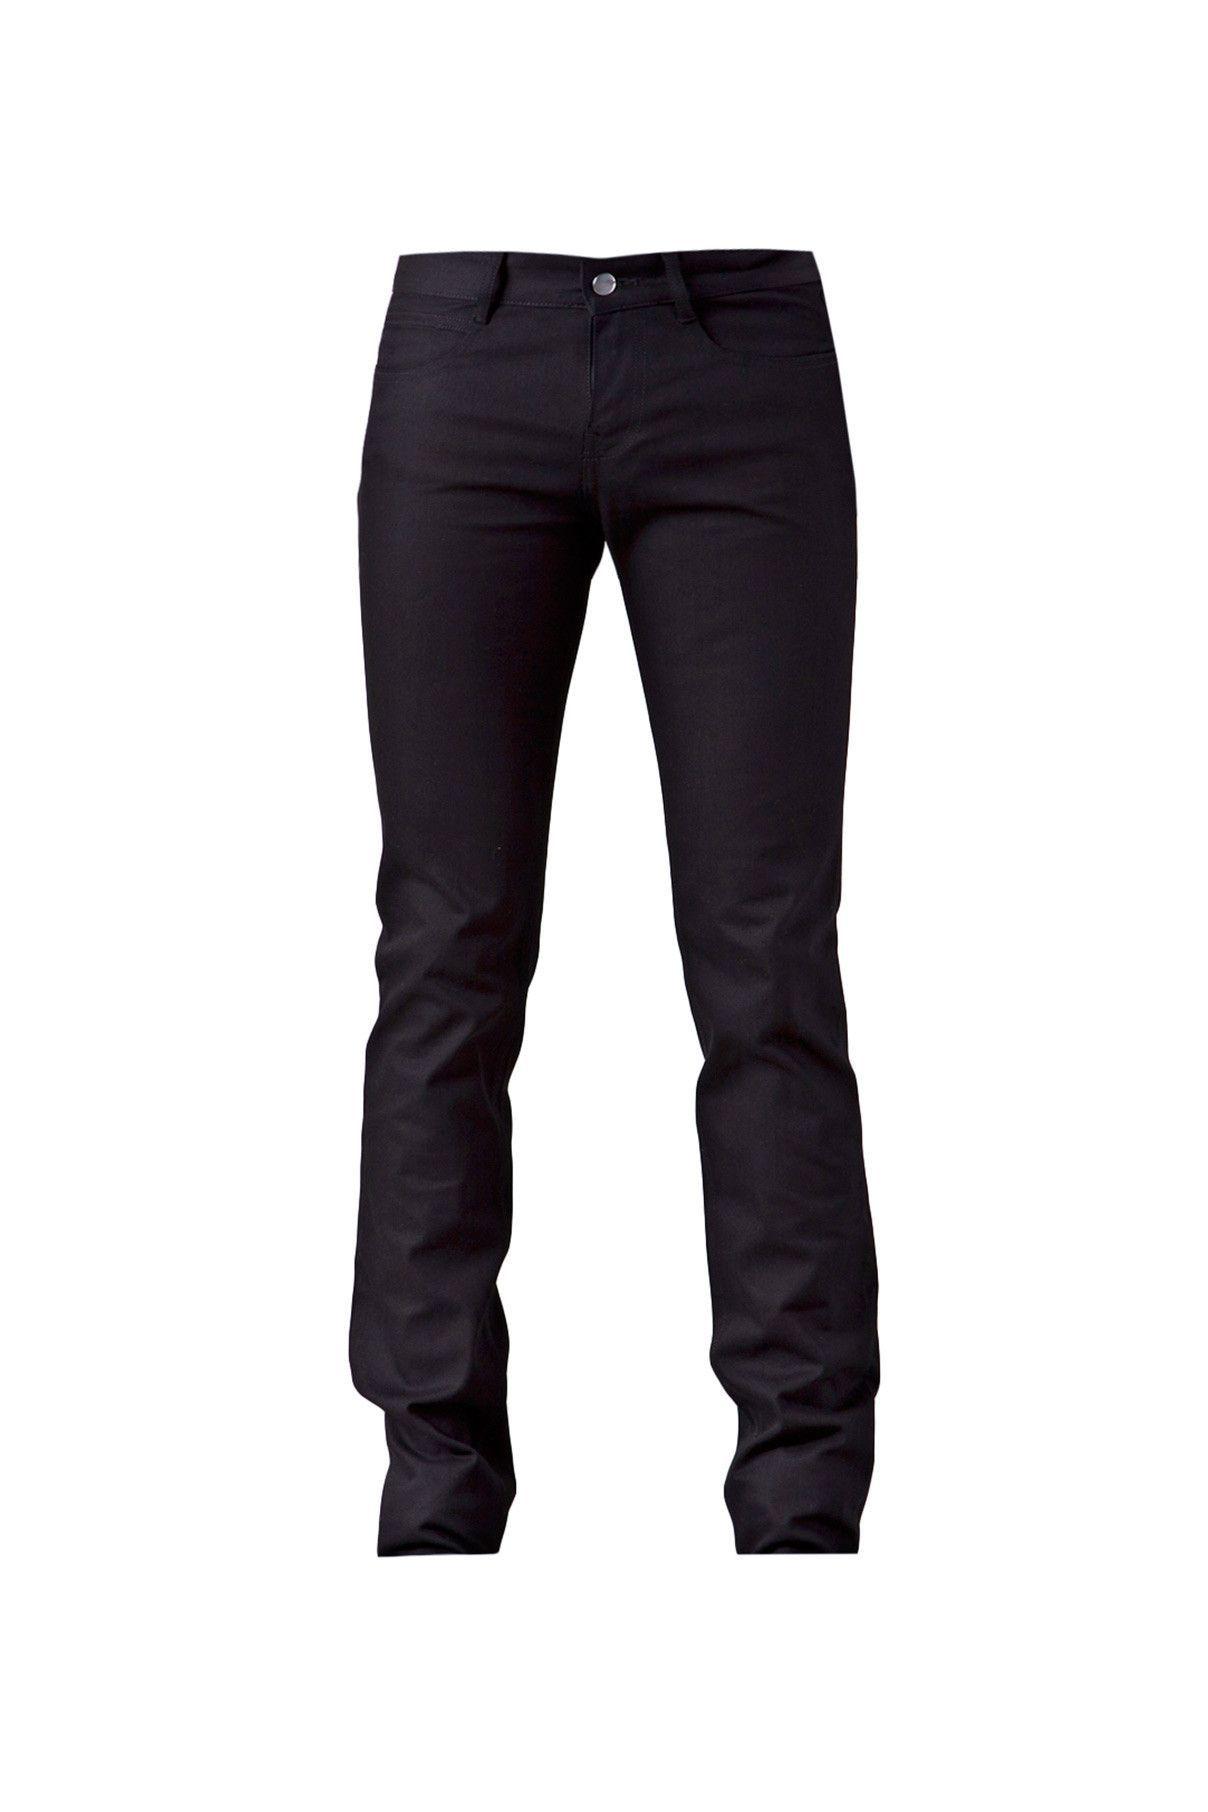 {Mugler / 01 clothing / 03 bottom / 02 denim} Jean